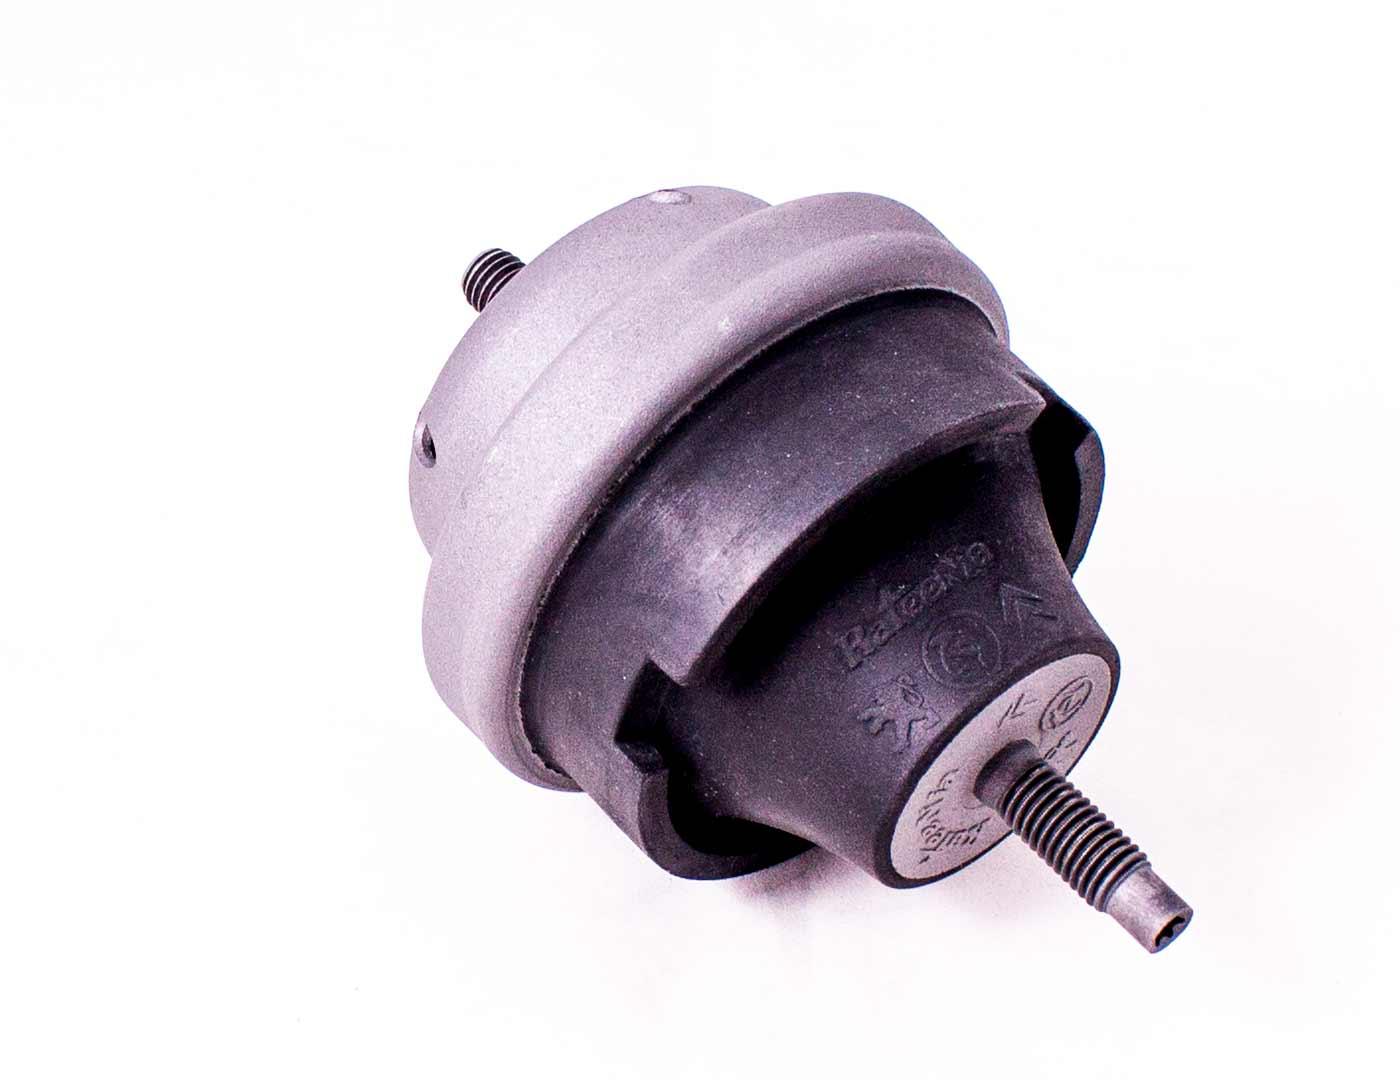 دسته موتور دو سر پیچ 405 (معمولی)